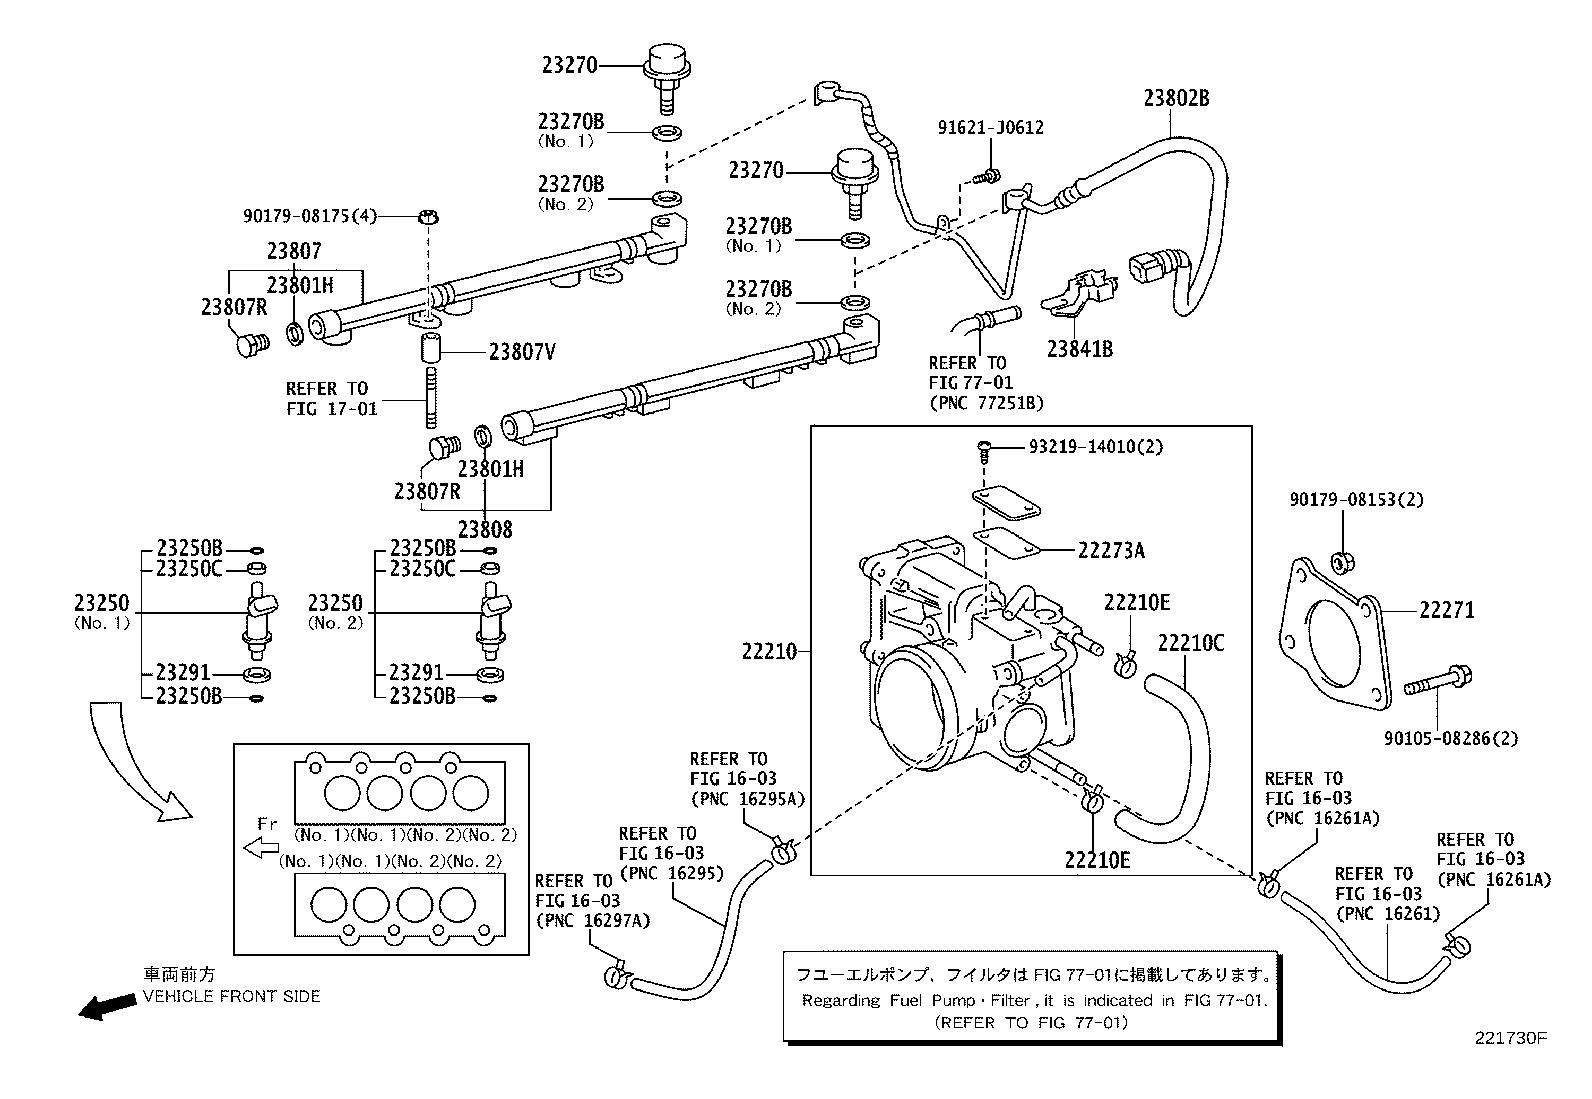 Lexus GS 350 Damper assembly, fuel pressure pulsation